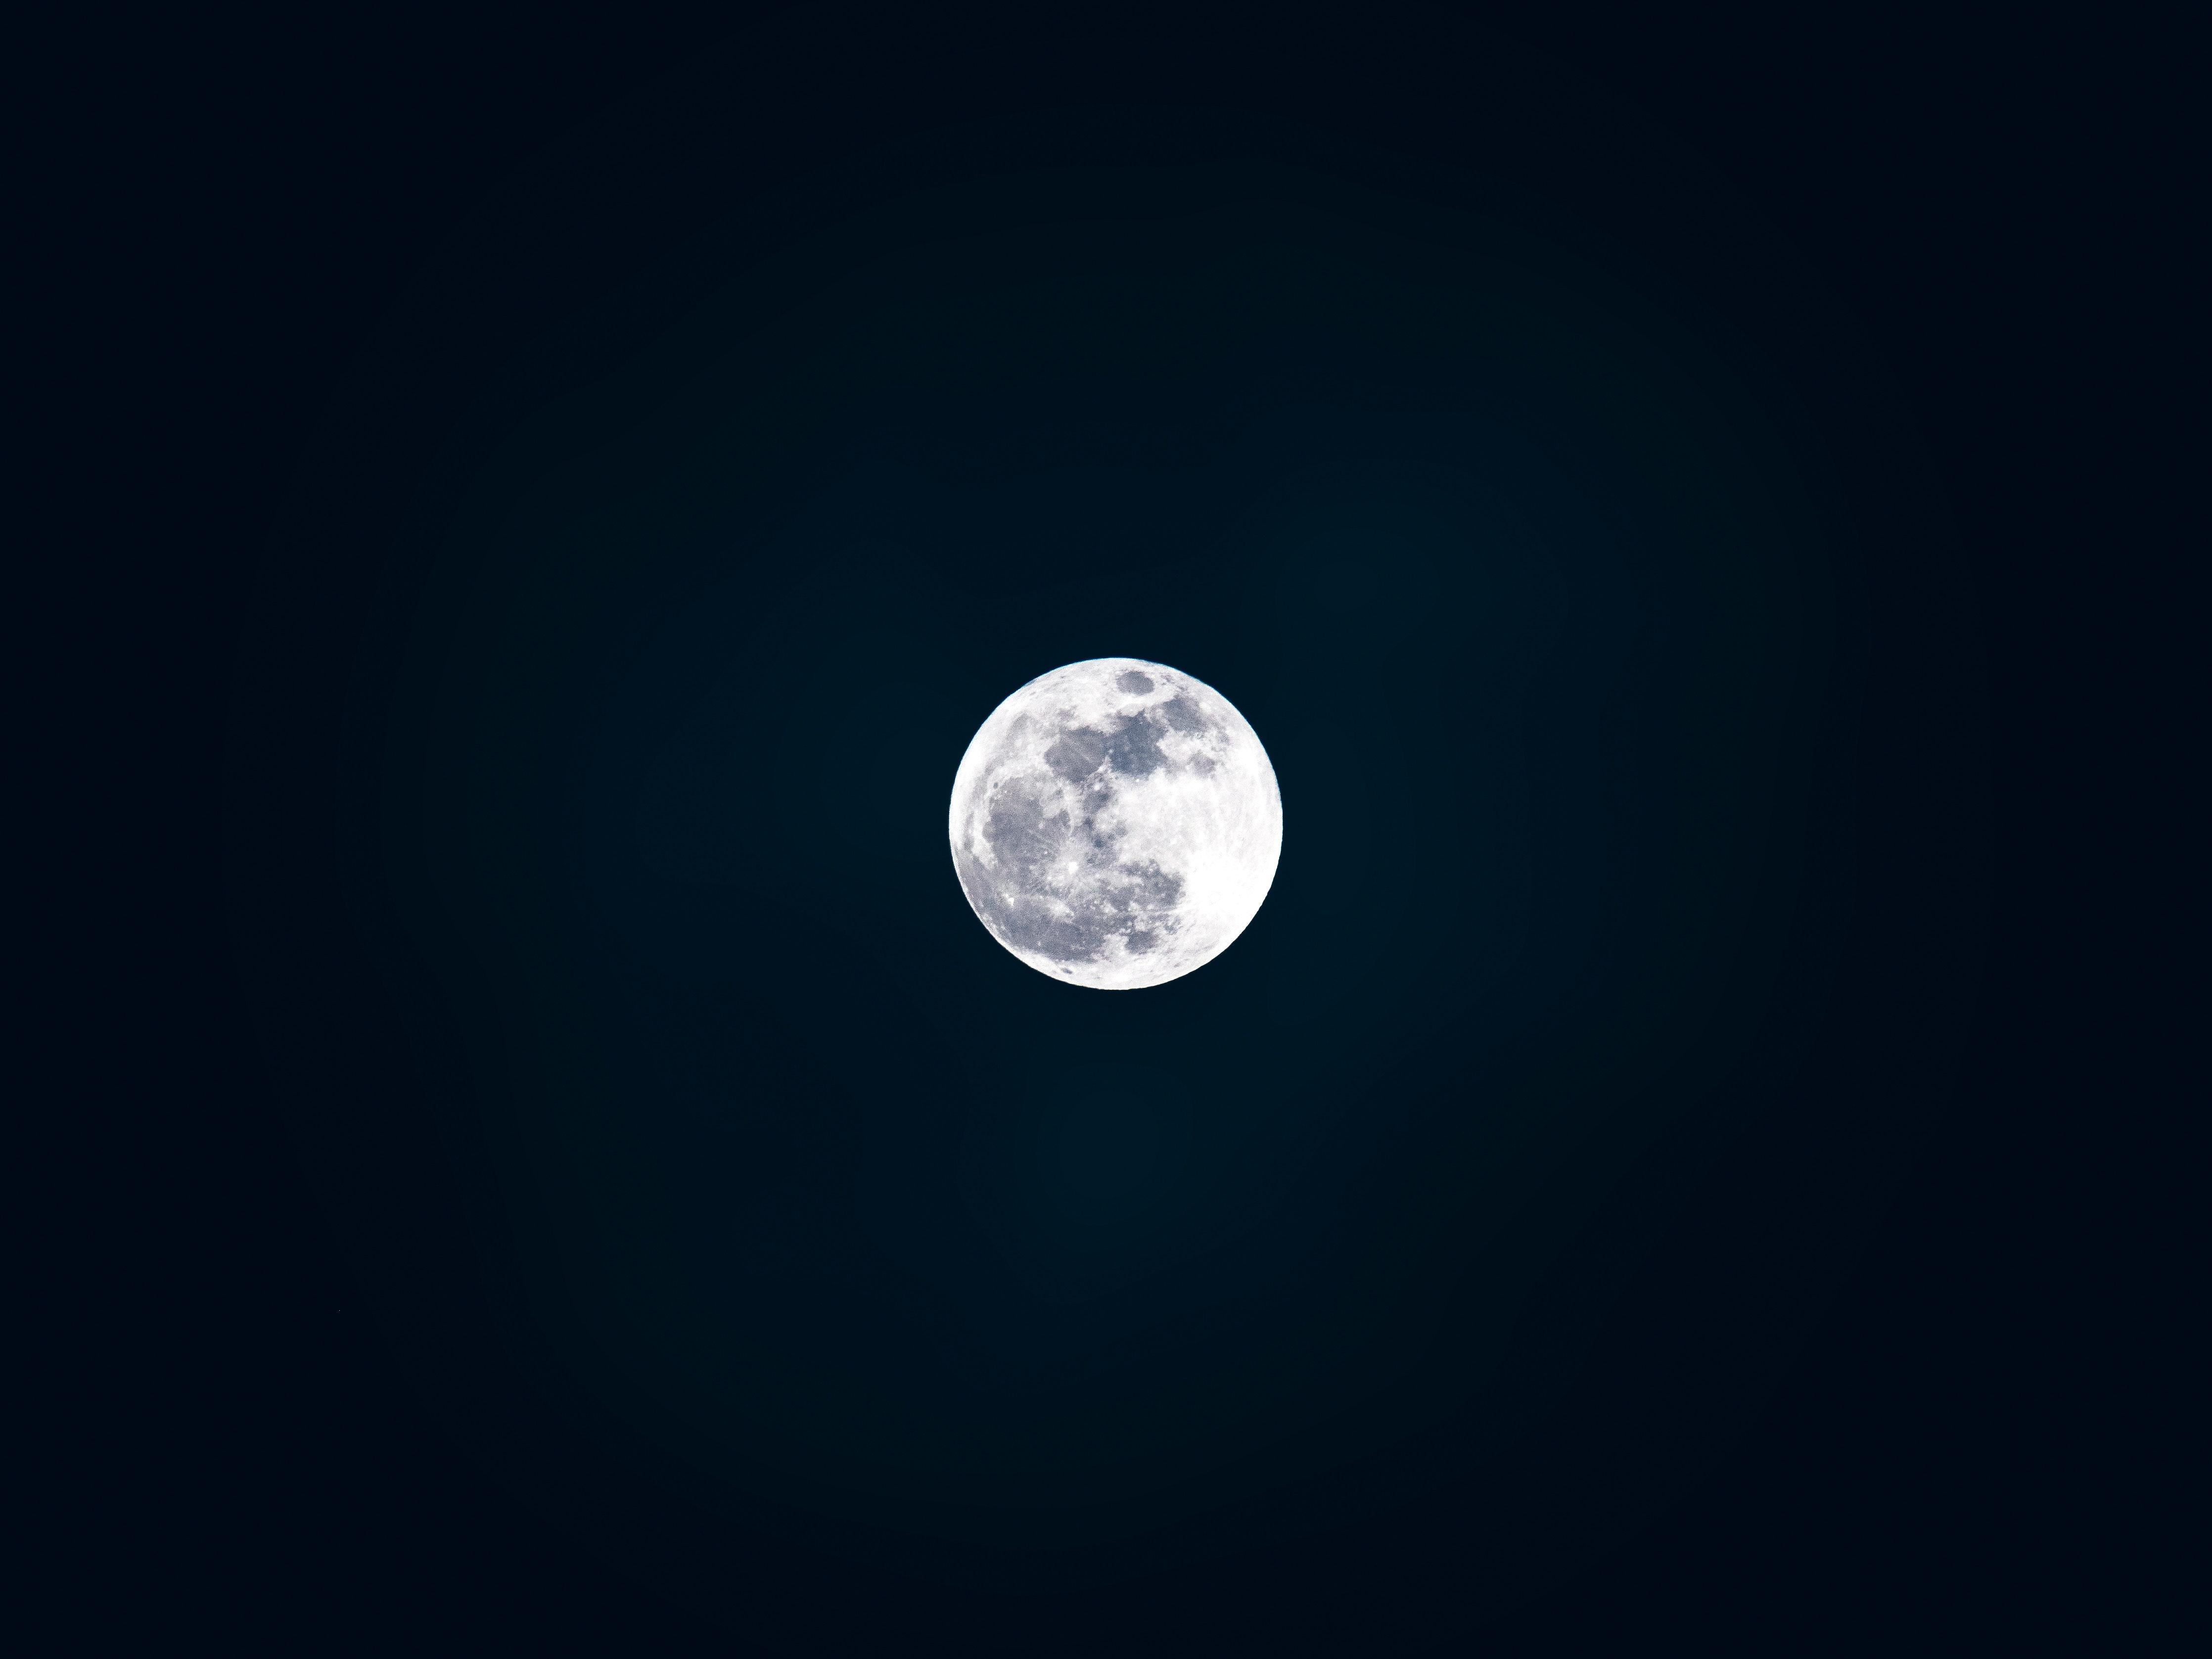 Free stock photo of black wallpaper, cosmos, full moon